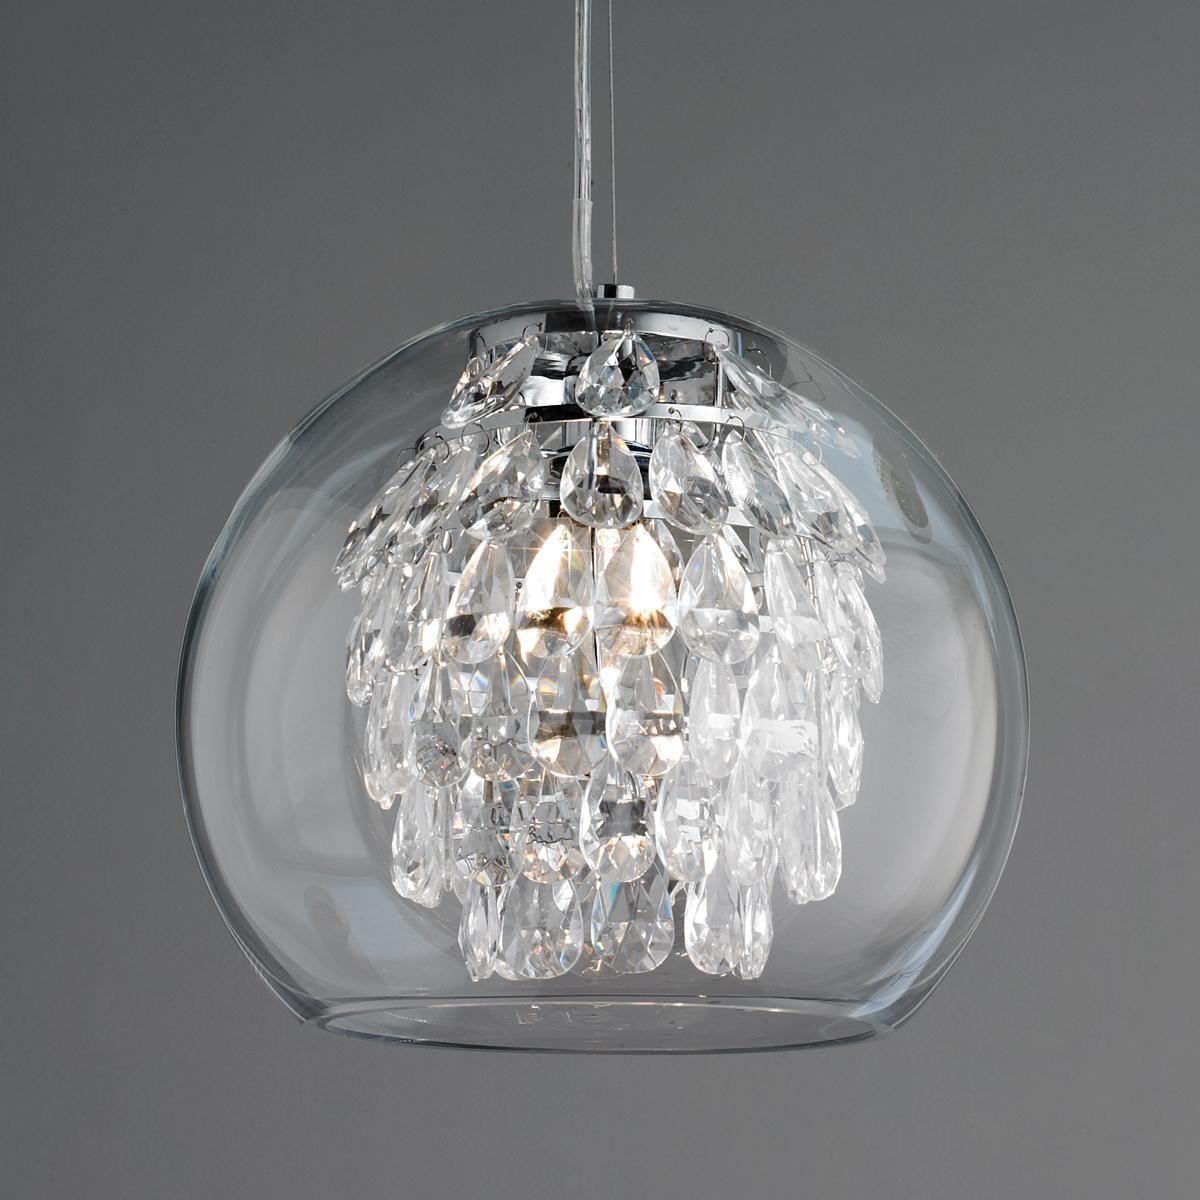 Glass Globe and Crystal Pendant Light   Pinterest